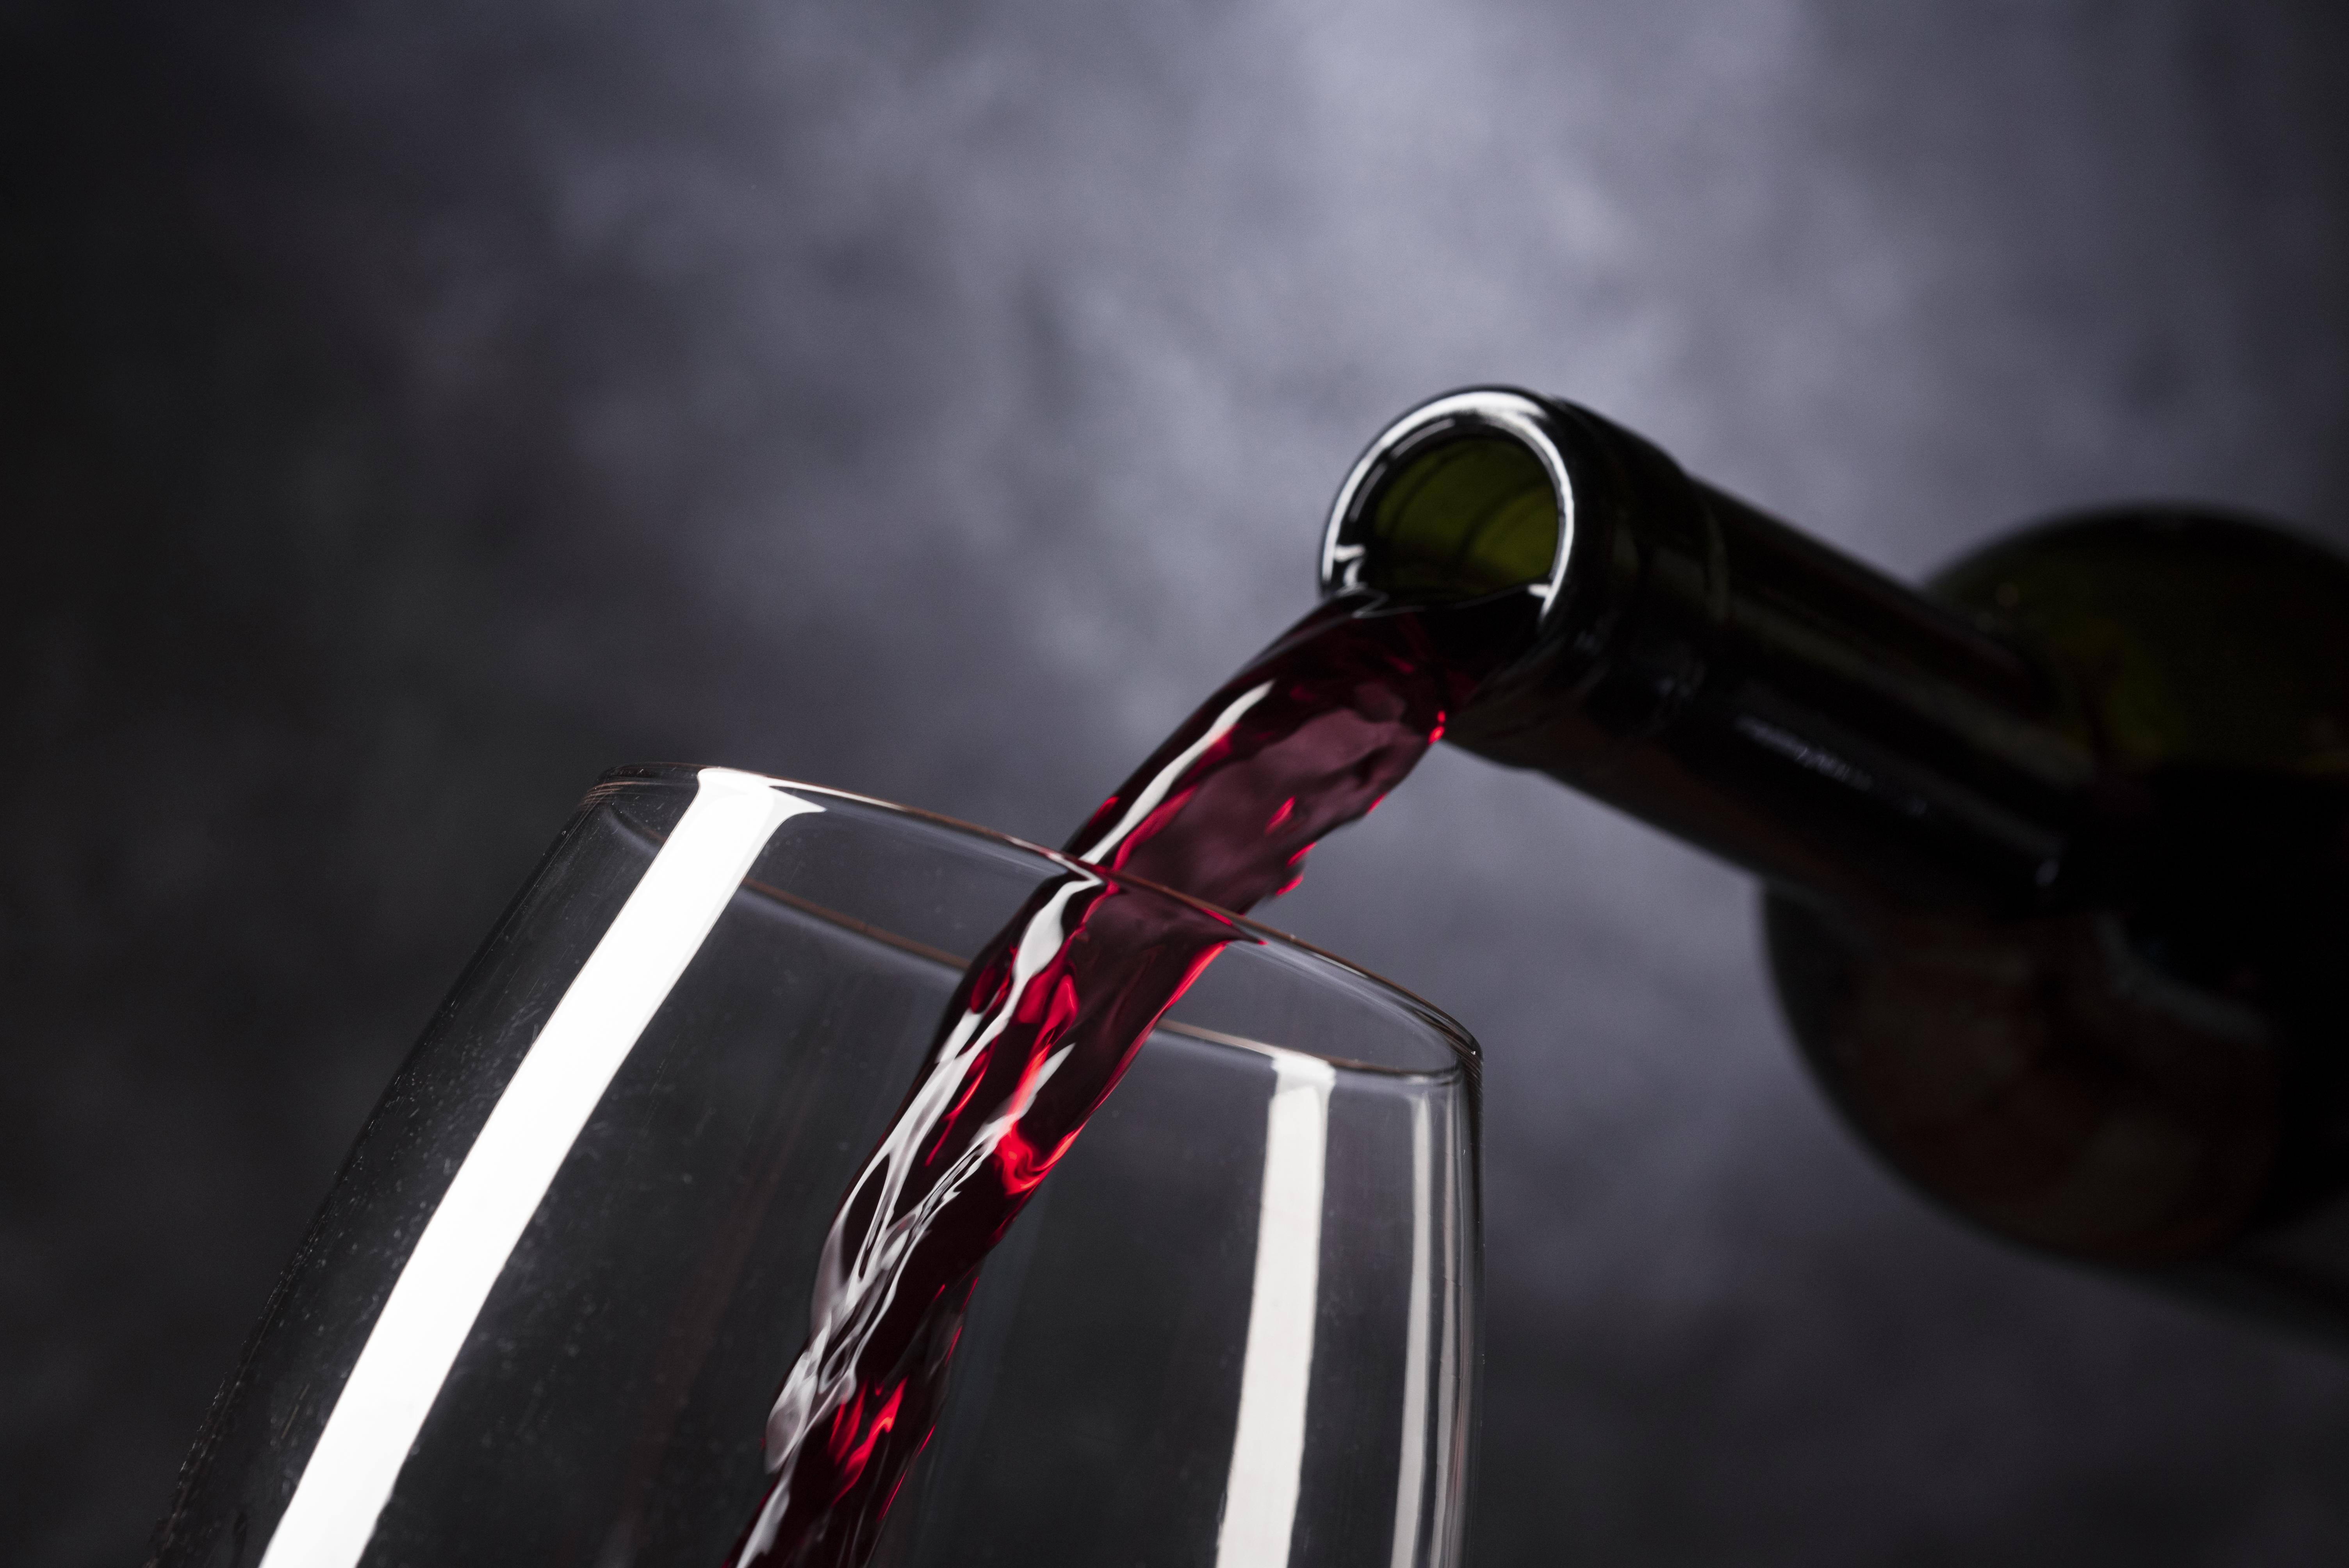 La persistenza del vino